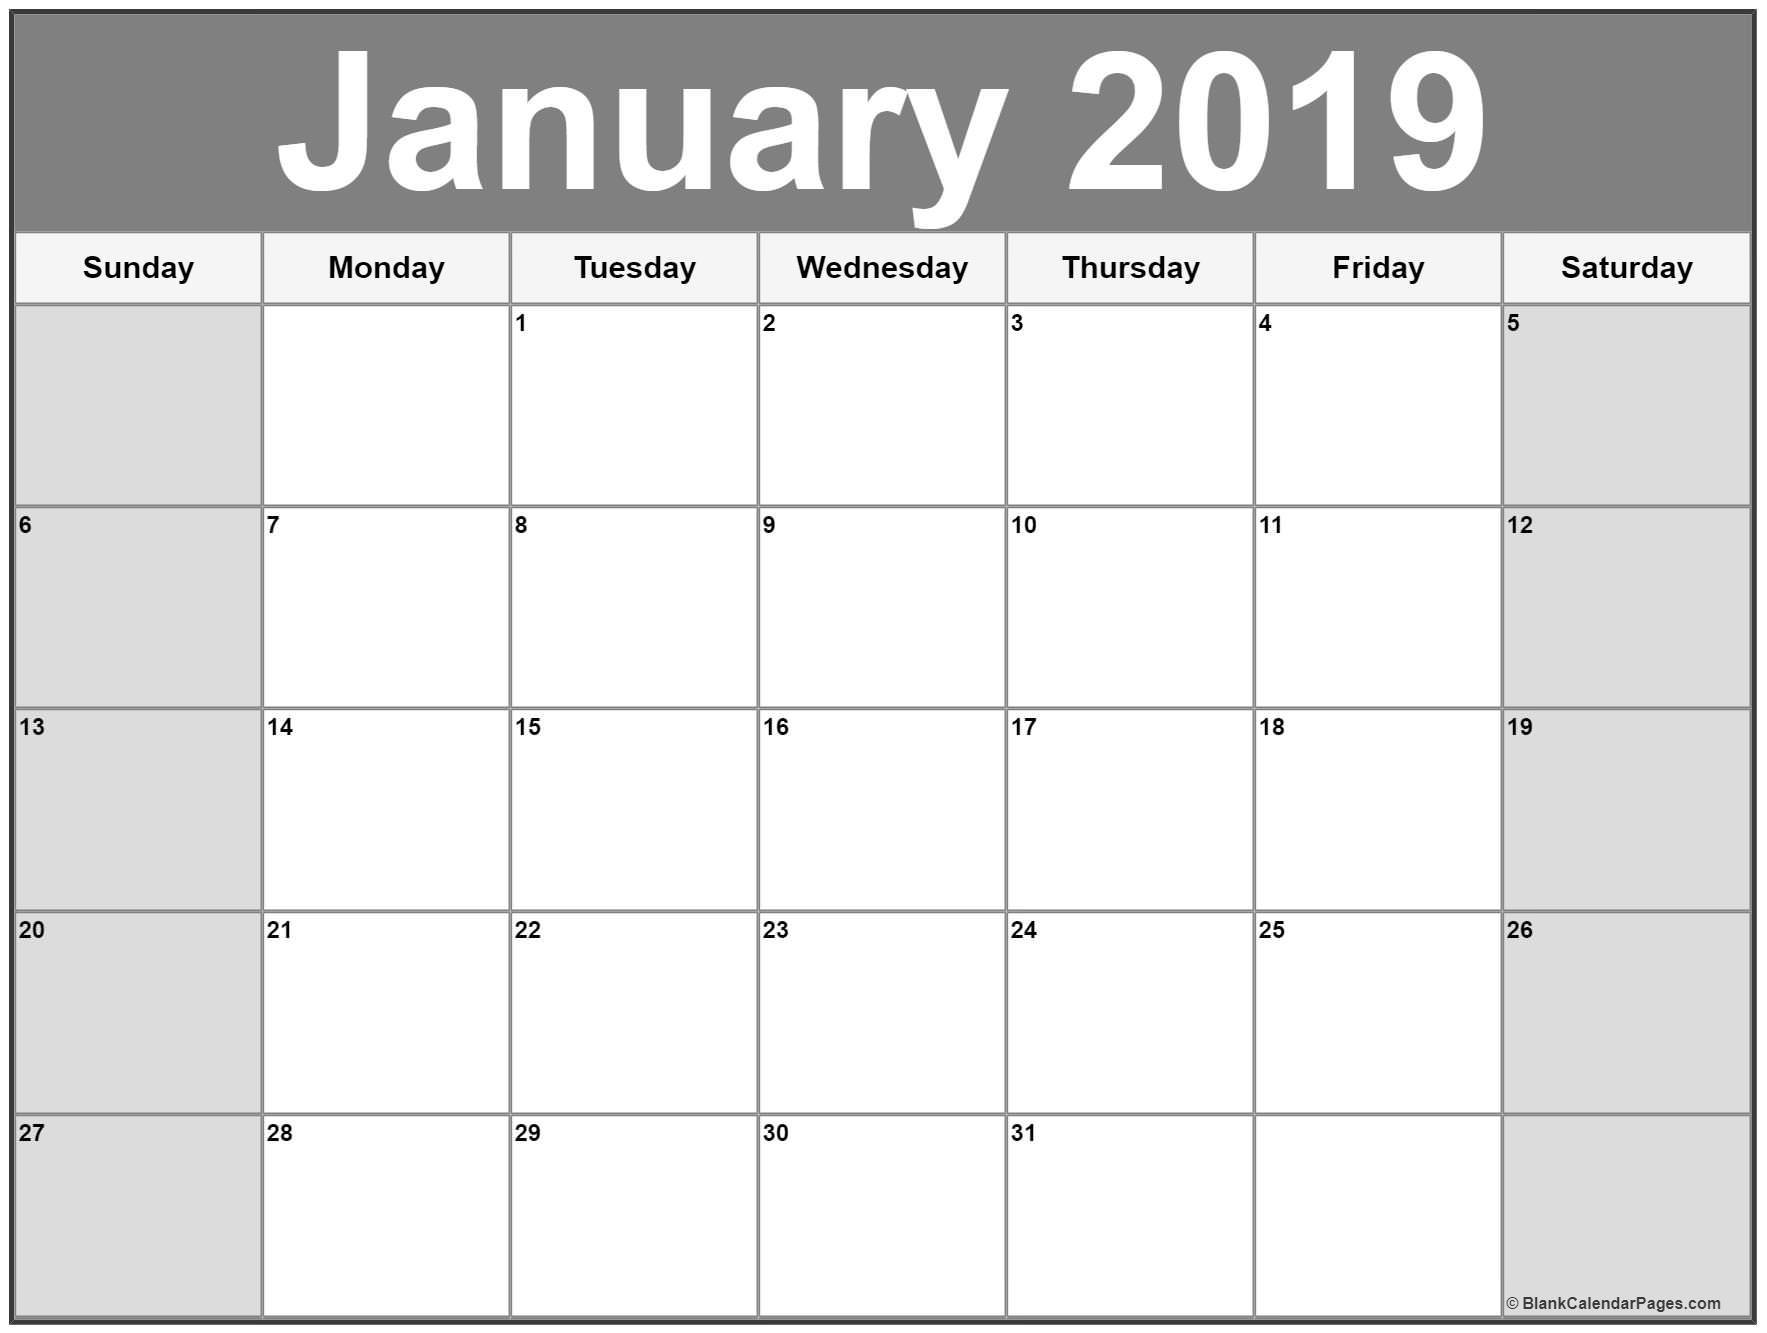 January Calendar 2019 Printable January 2019 Calendar